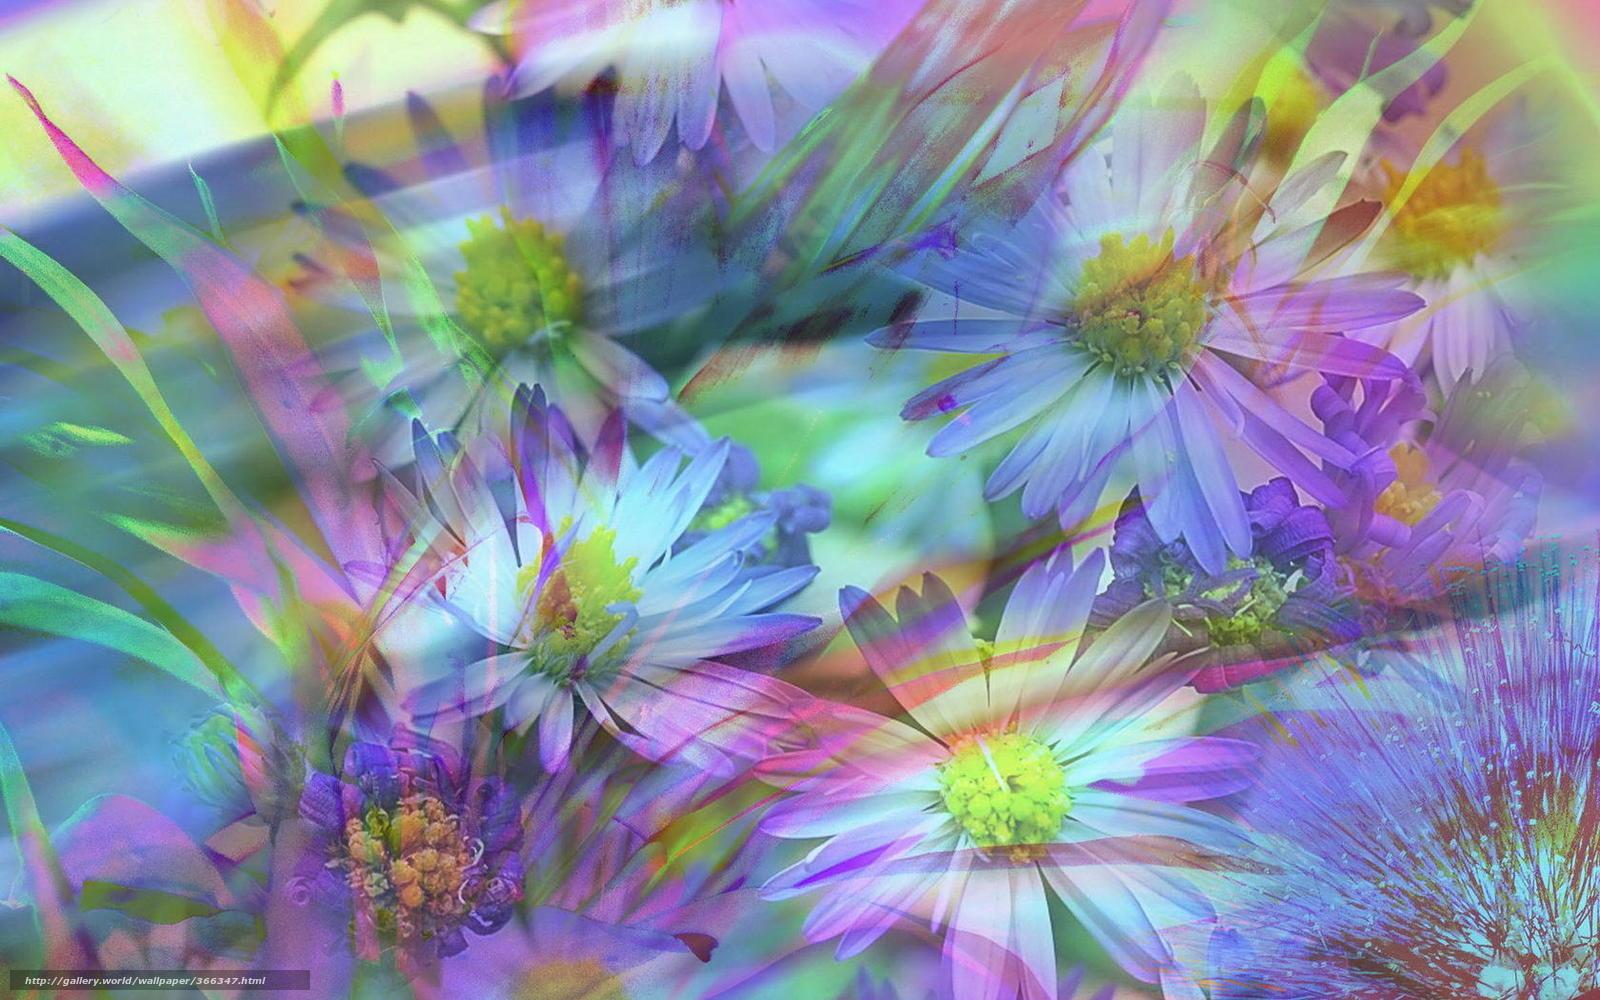 нежно, фиолетовый, красиво, фон, цветы ...: www.гудфон.рф/обои/366347-nejno_fioletovyiy_krasivo_fon...